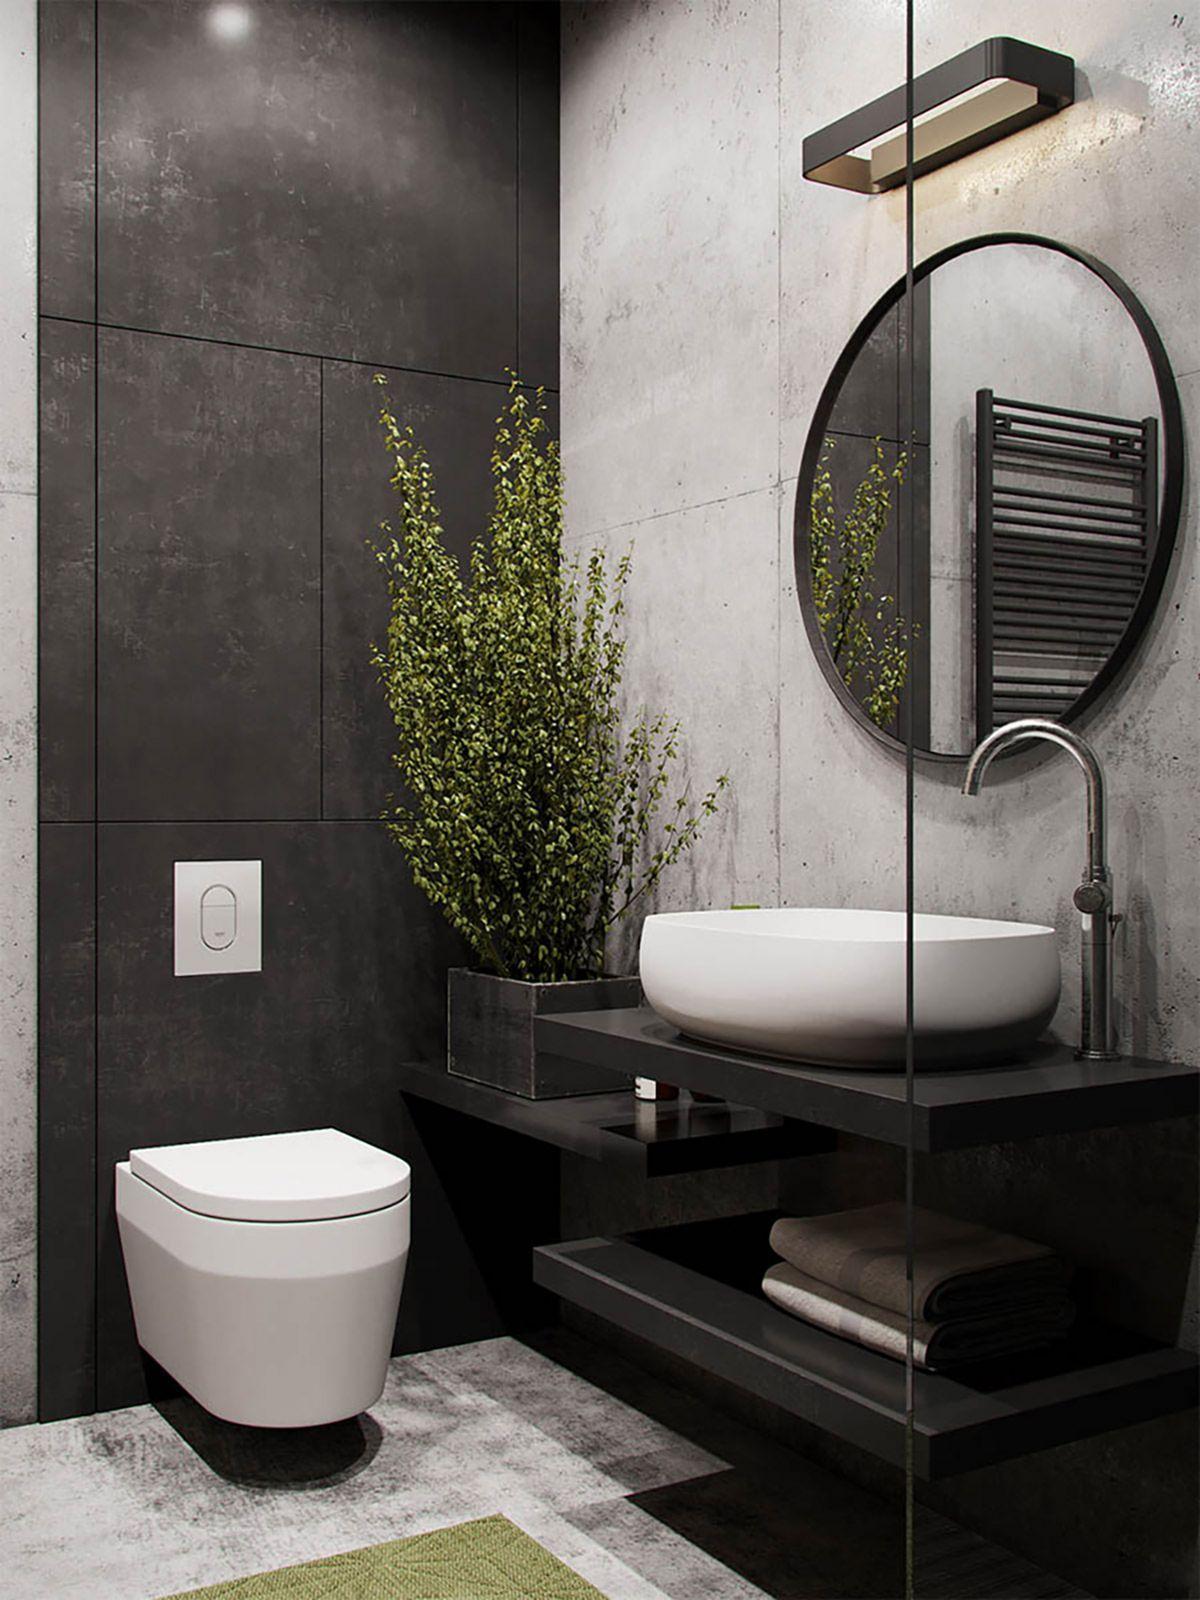 15 Gorgeous Industrial Bathroom Decoration Ideas The Most Popular Industrial Bathroom Design Industrial Style Bathroom Bathroom Remodel Designs